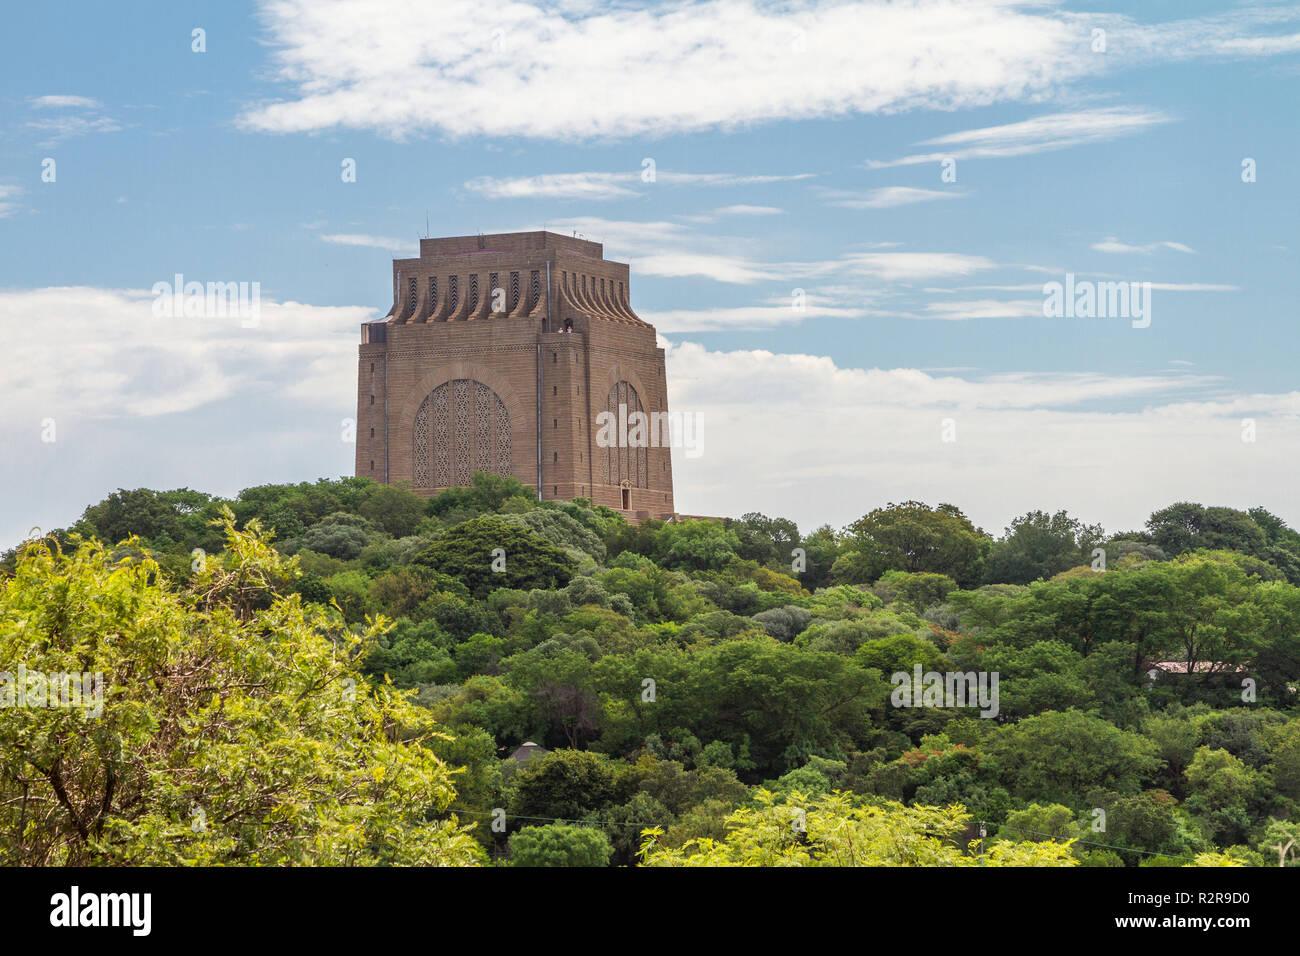 Voortrekker Monument, Pretoria, South Africa - Stock Image